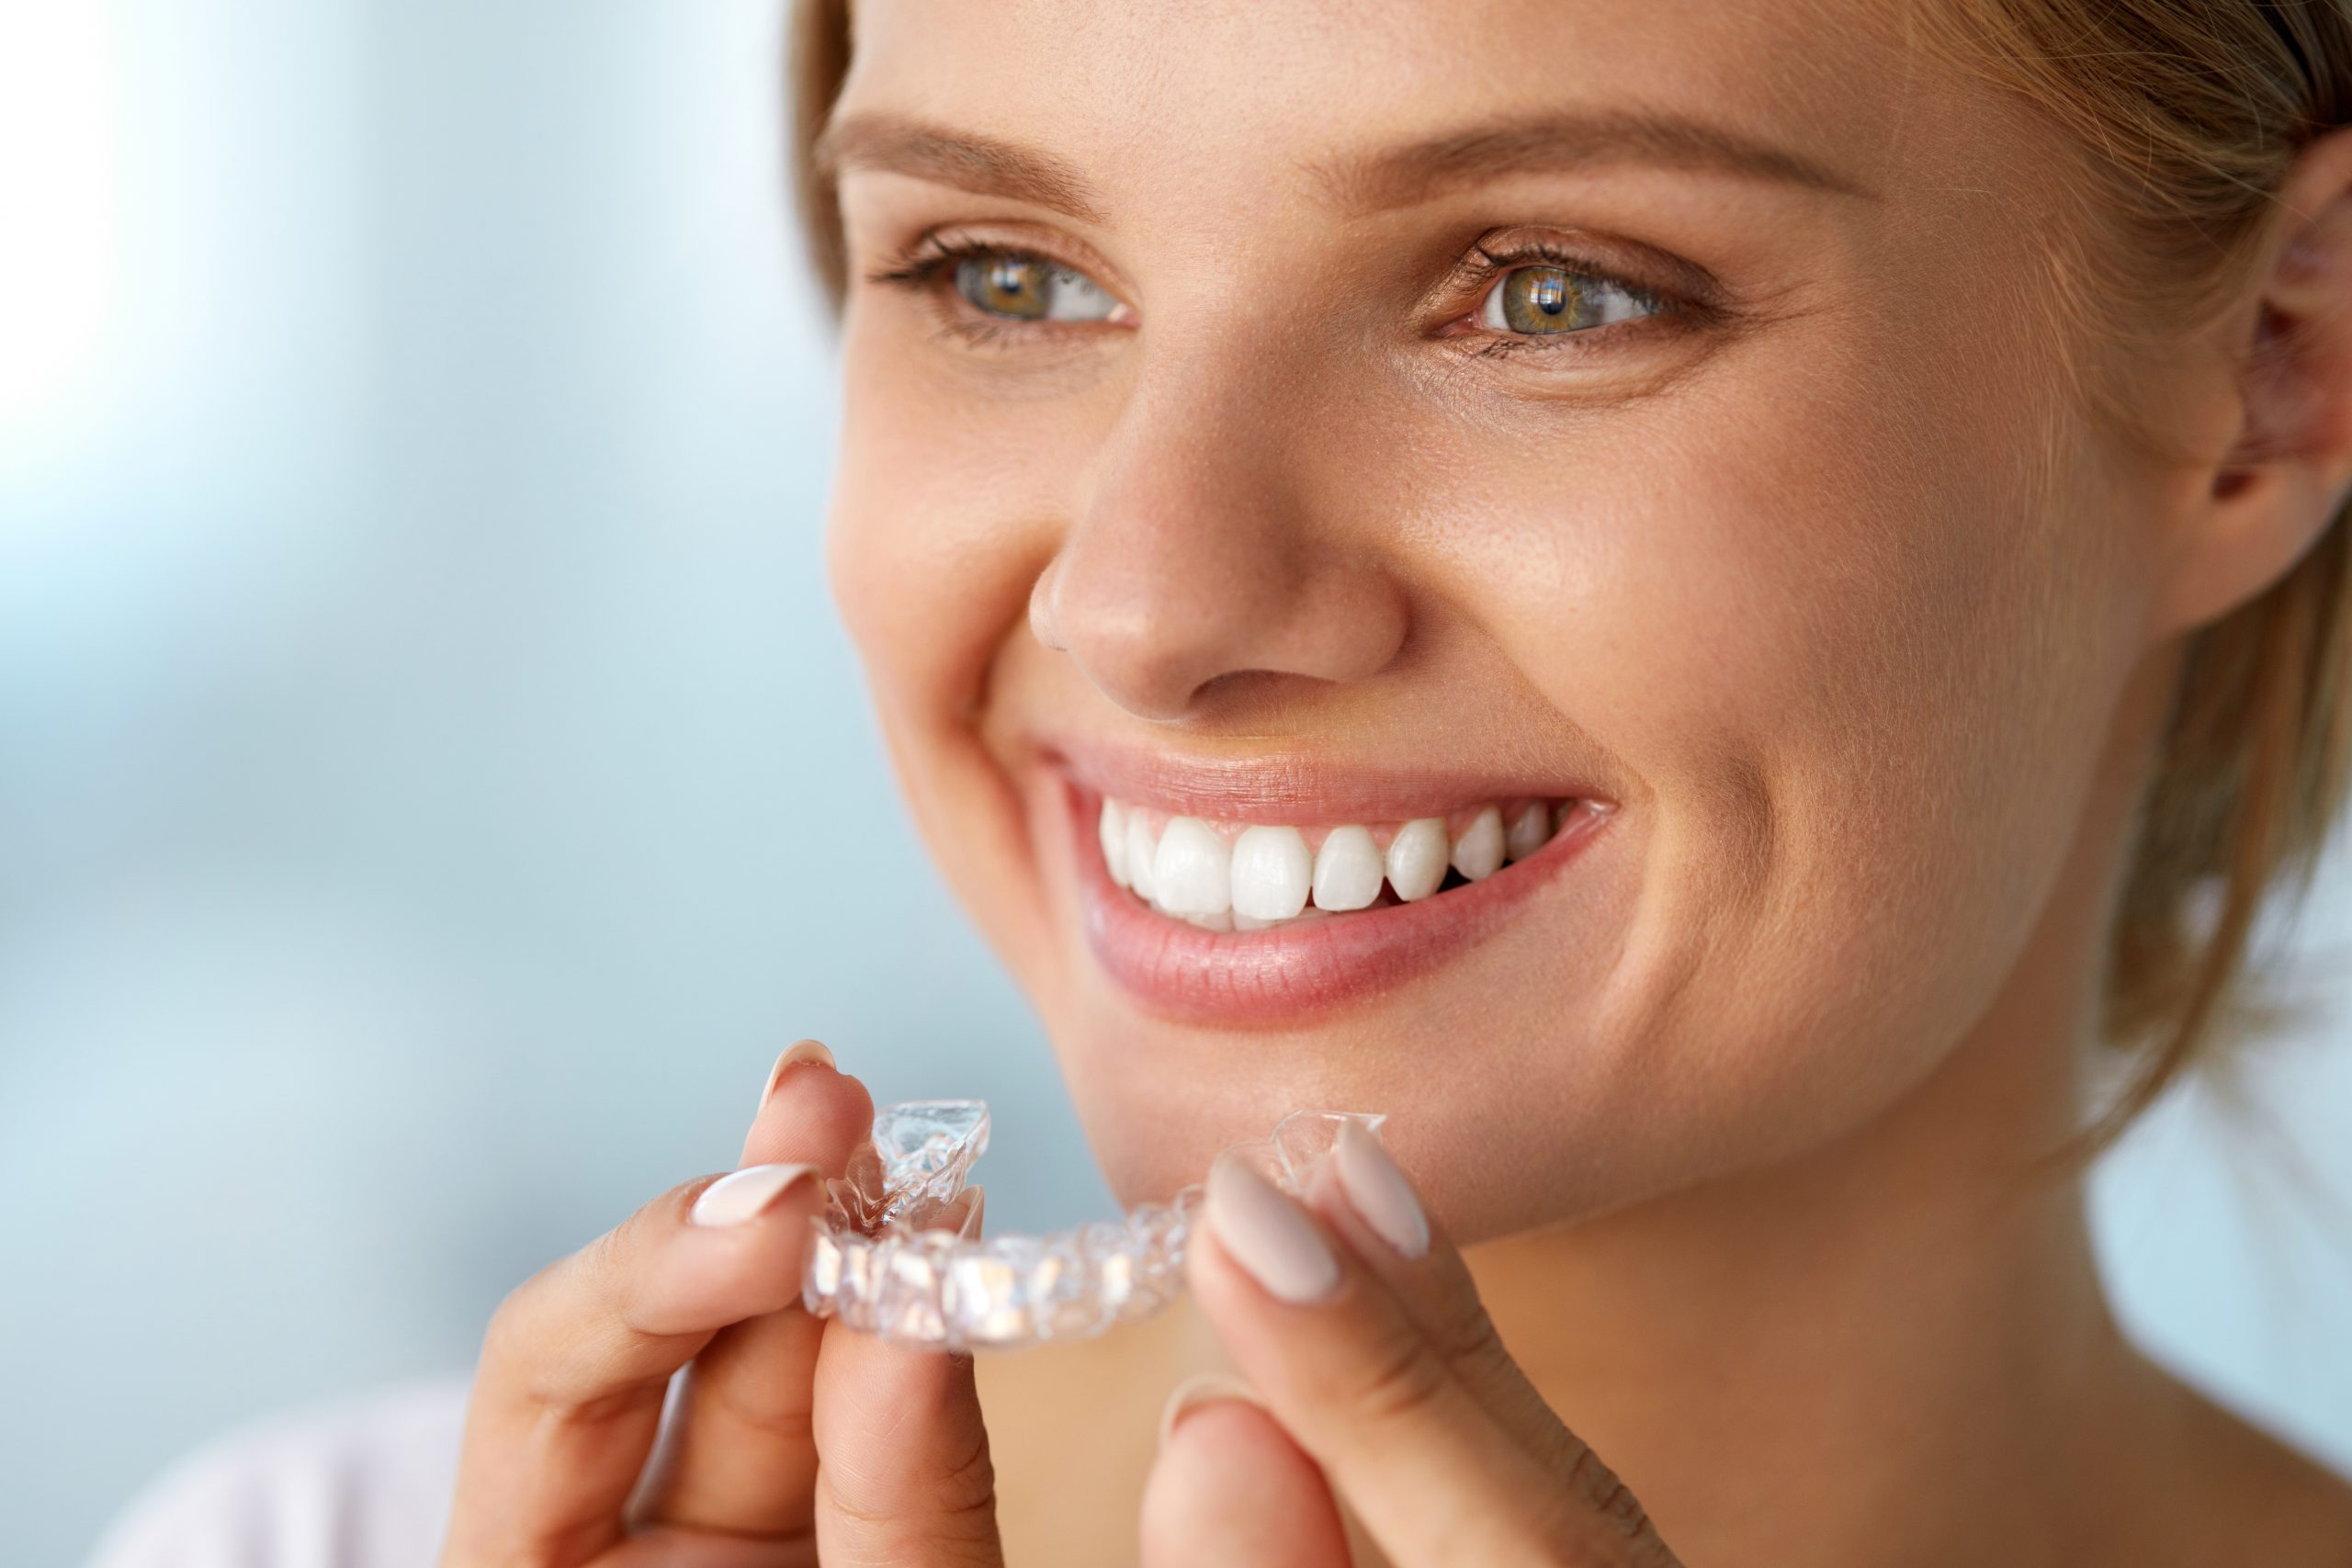 Expectativas altas en resultados odontológicos.